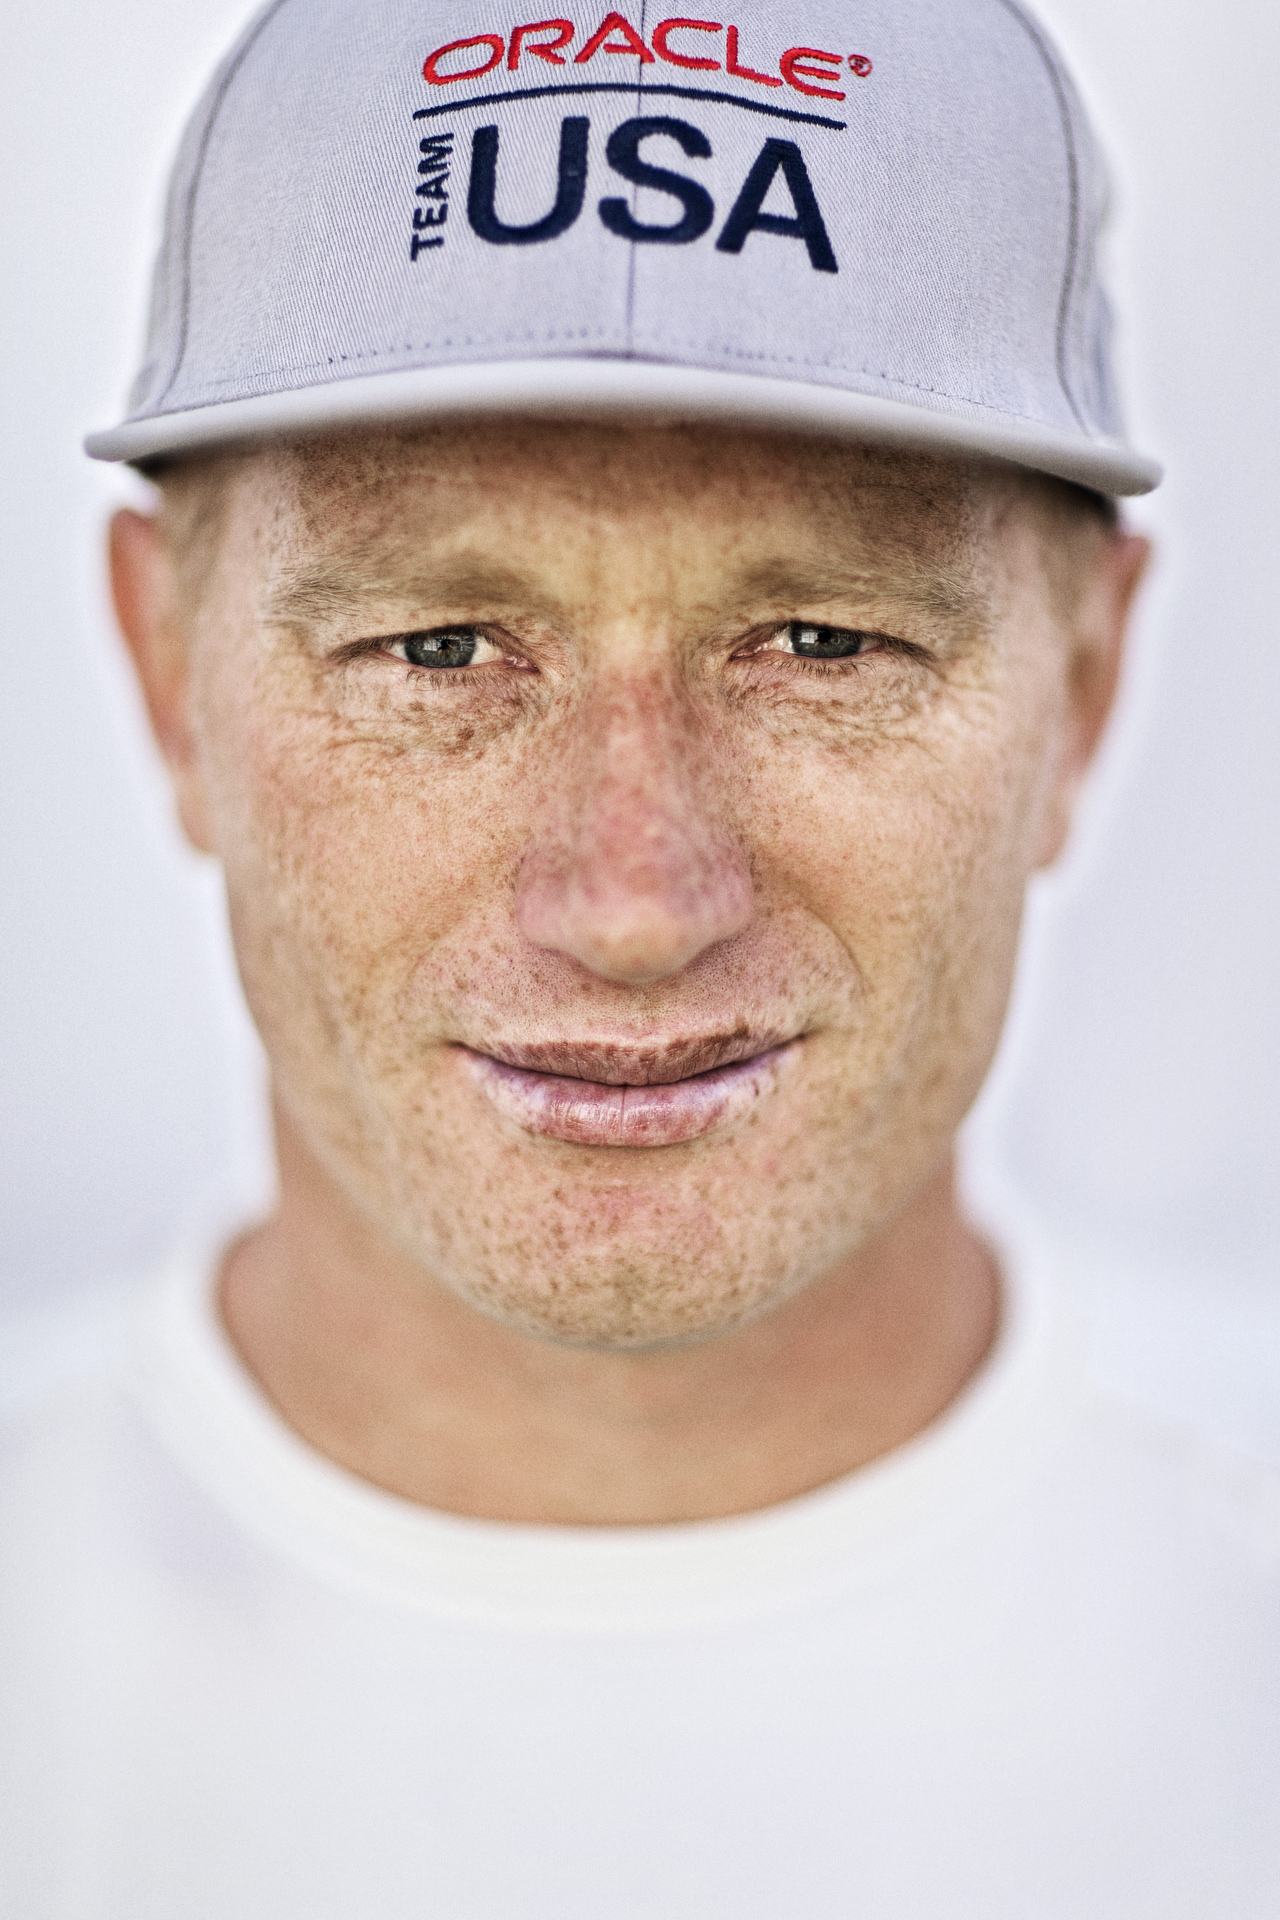 Sydney portrait photographer, personal branding, Eye2Eye, actor, headshots, corporate photography, corporate headshots, portraits, head shots, James Spithill, America's Cup